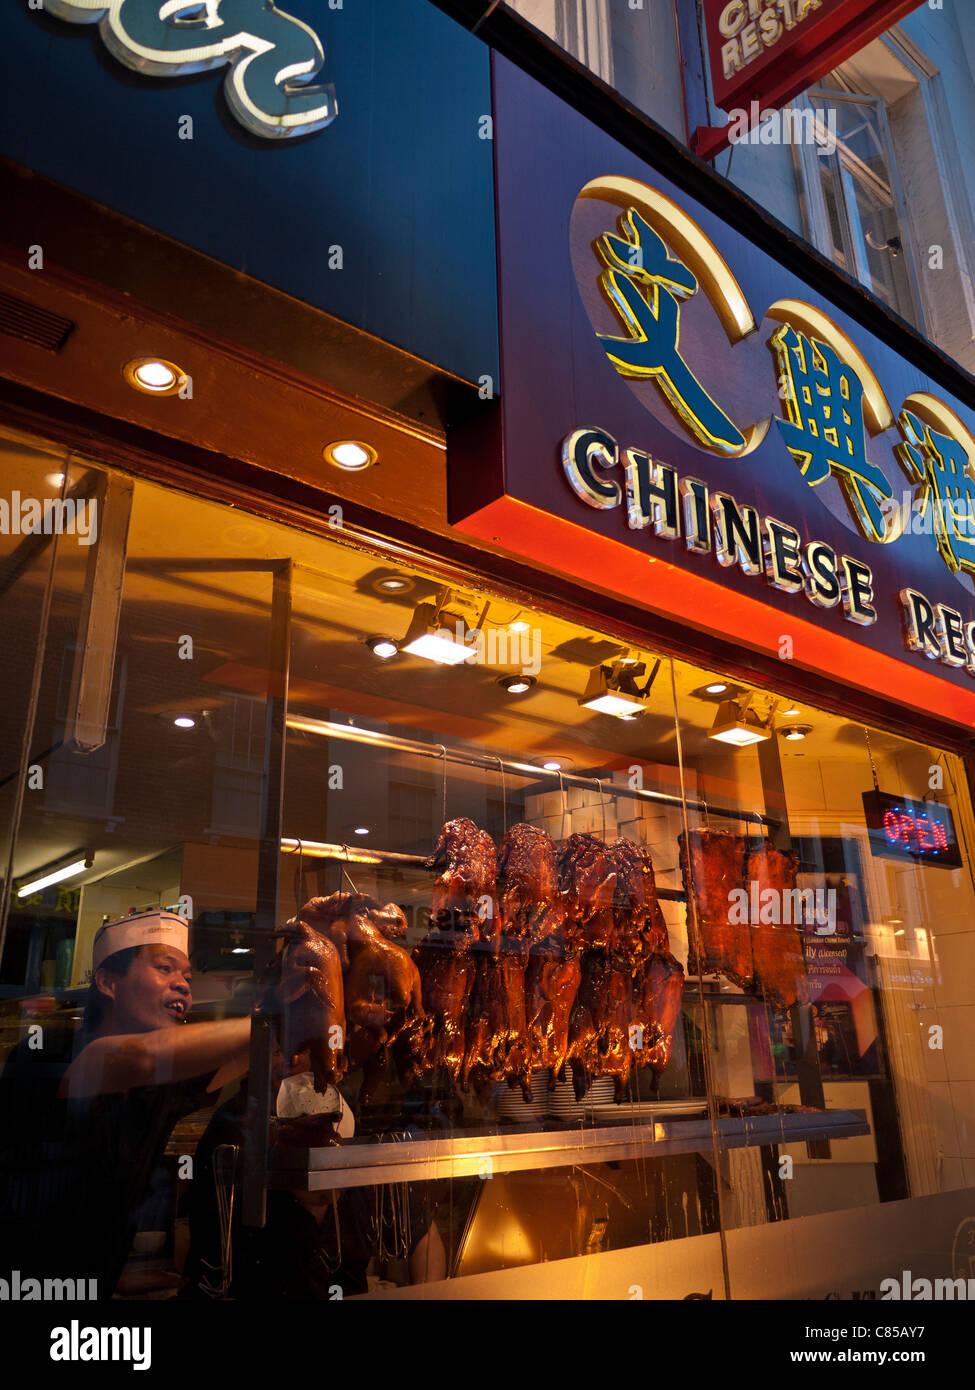 Chef arranging rows of Peking crispy duck hanging air drying in Chinese restaurant Gerrard Street Chinatown Soho - Stock Image